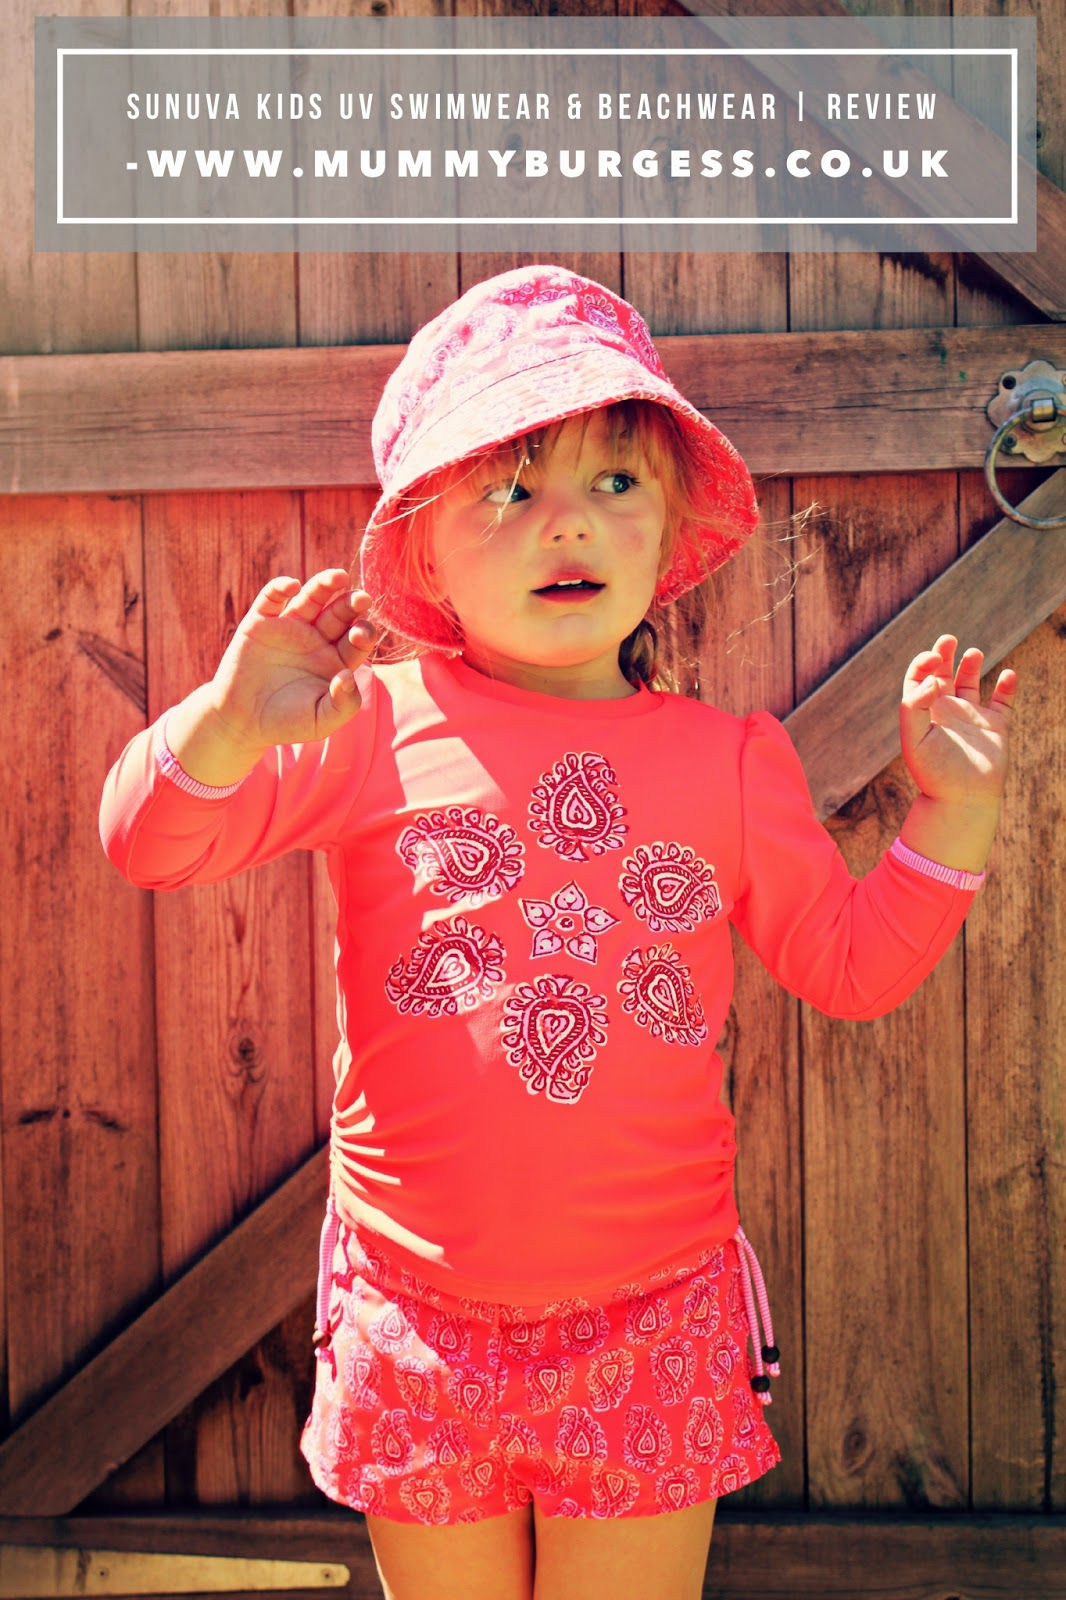 37268d23c9 SUNUVA | Kids UV Swimwear & Beachwear | Review | K Elizabeth